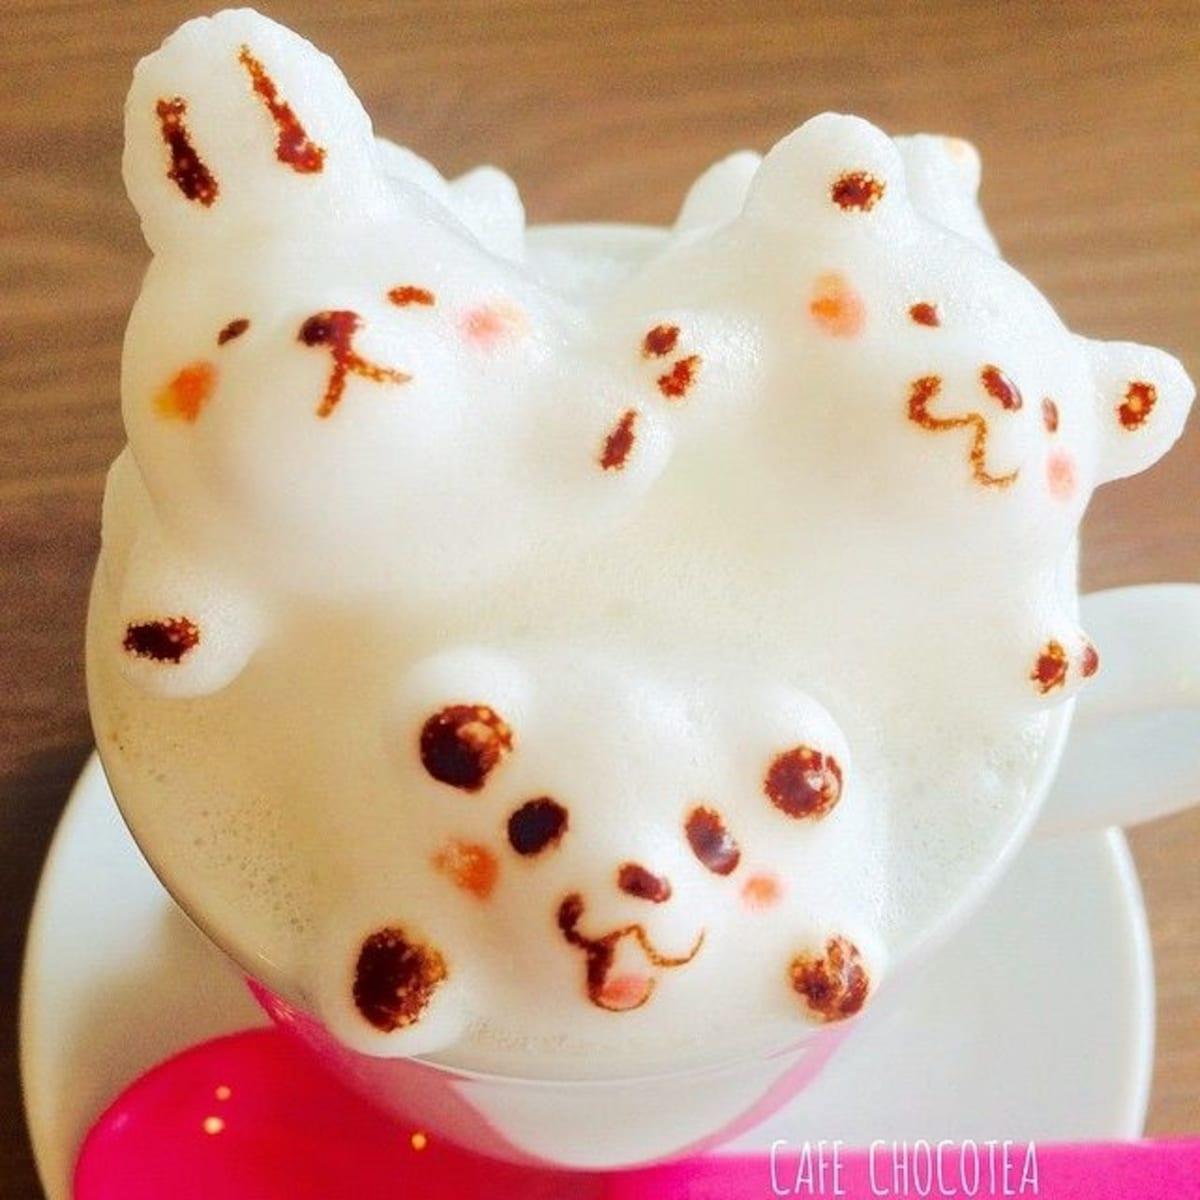 5. Cafe ChocoTea (Saitama)